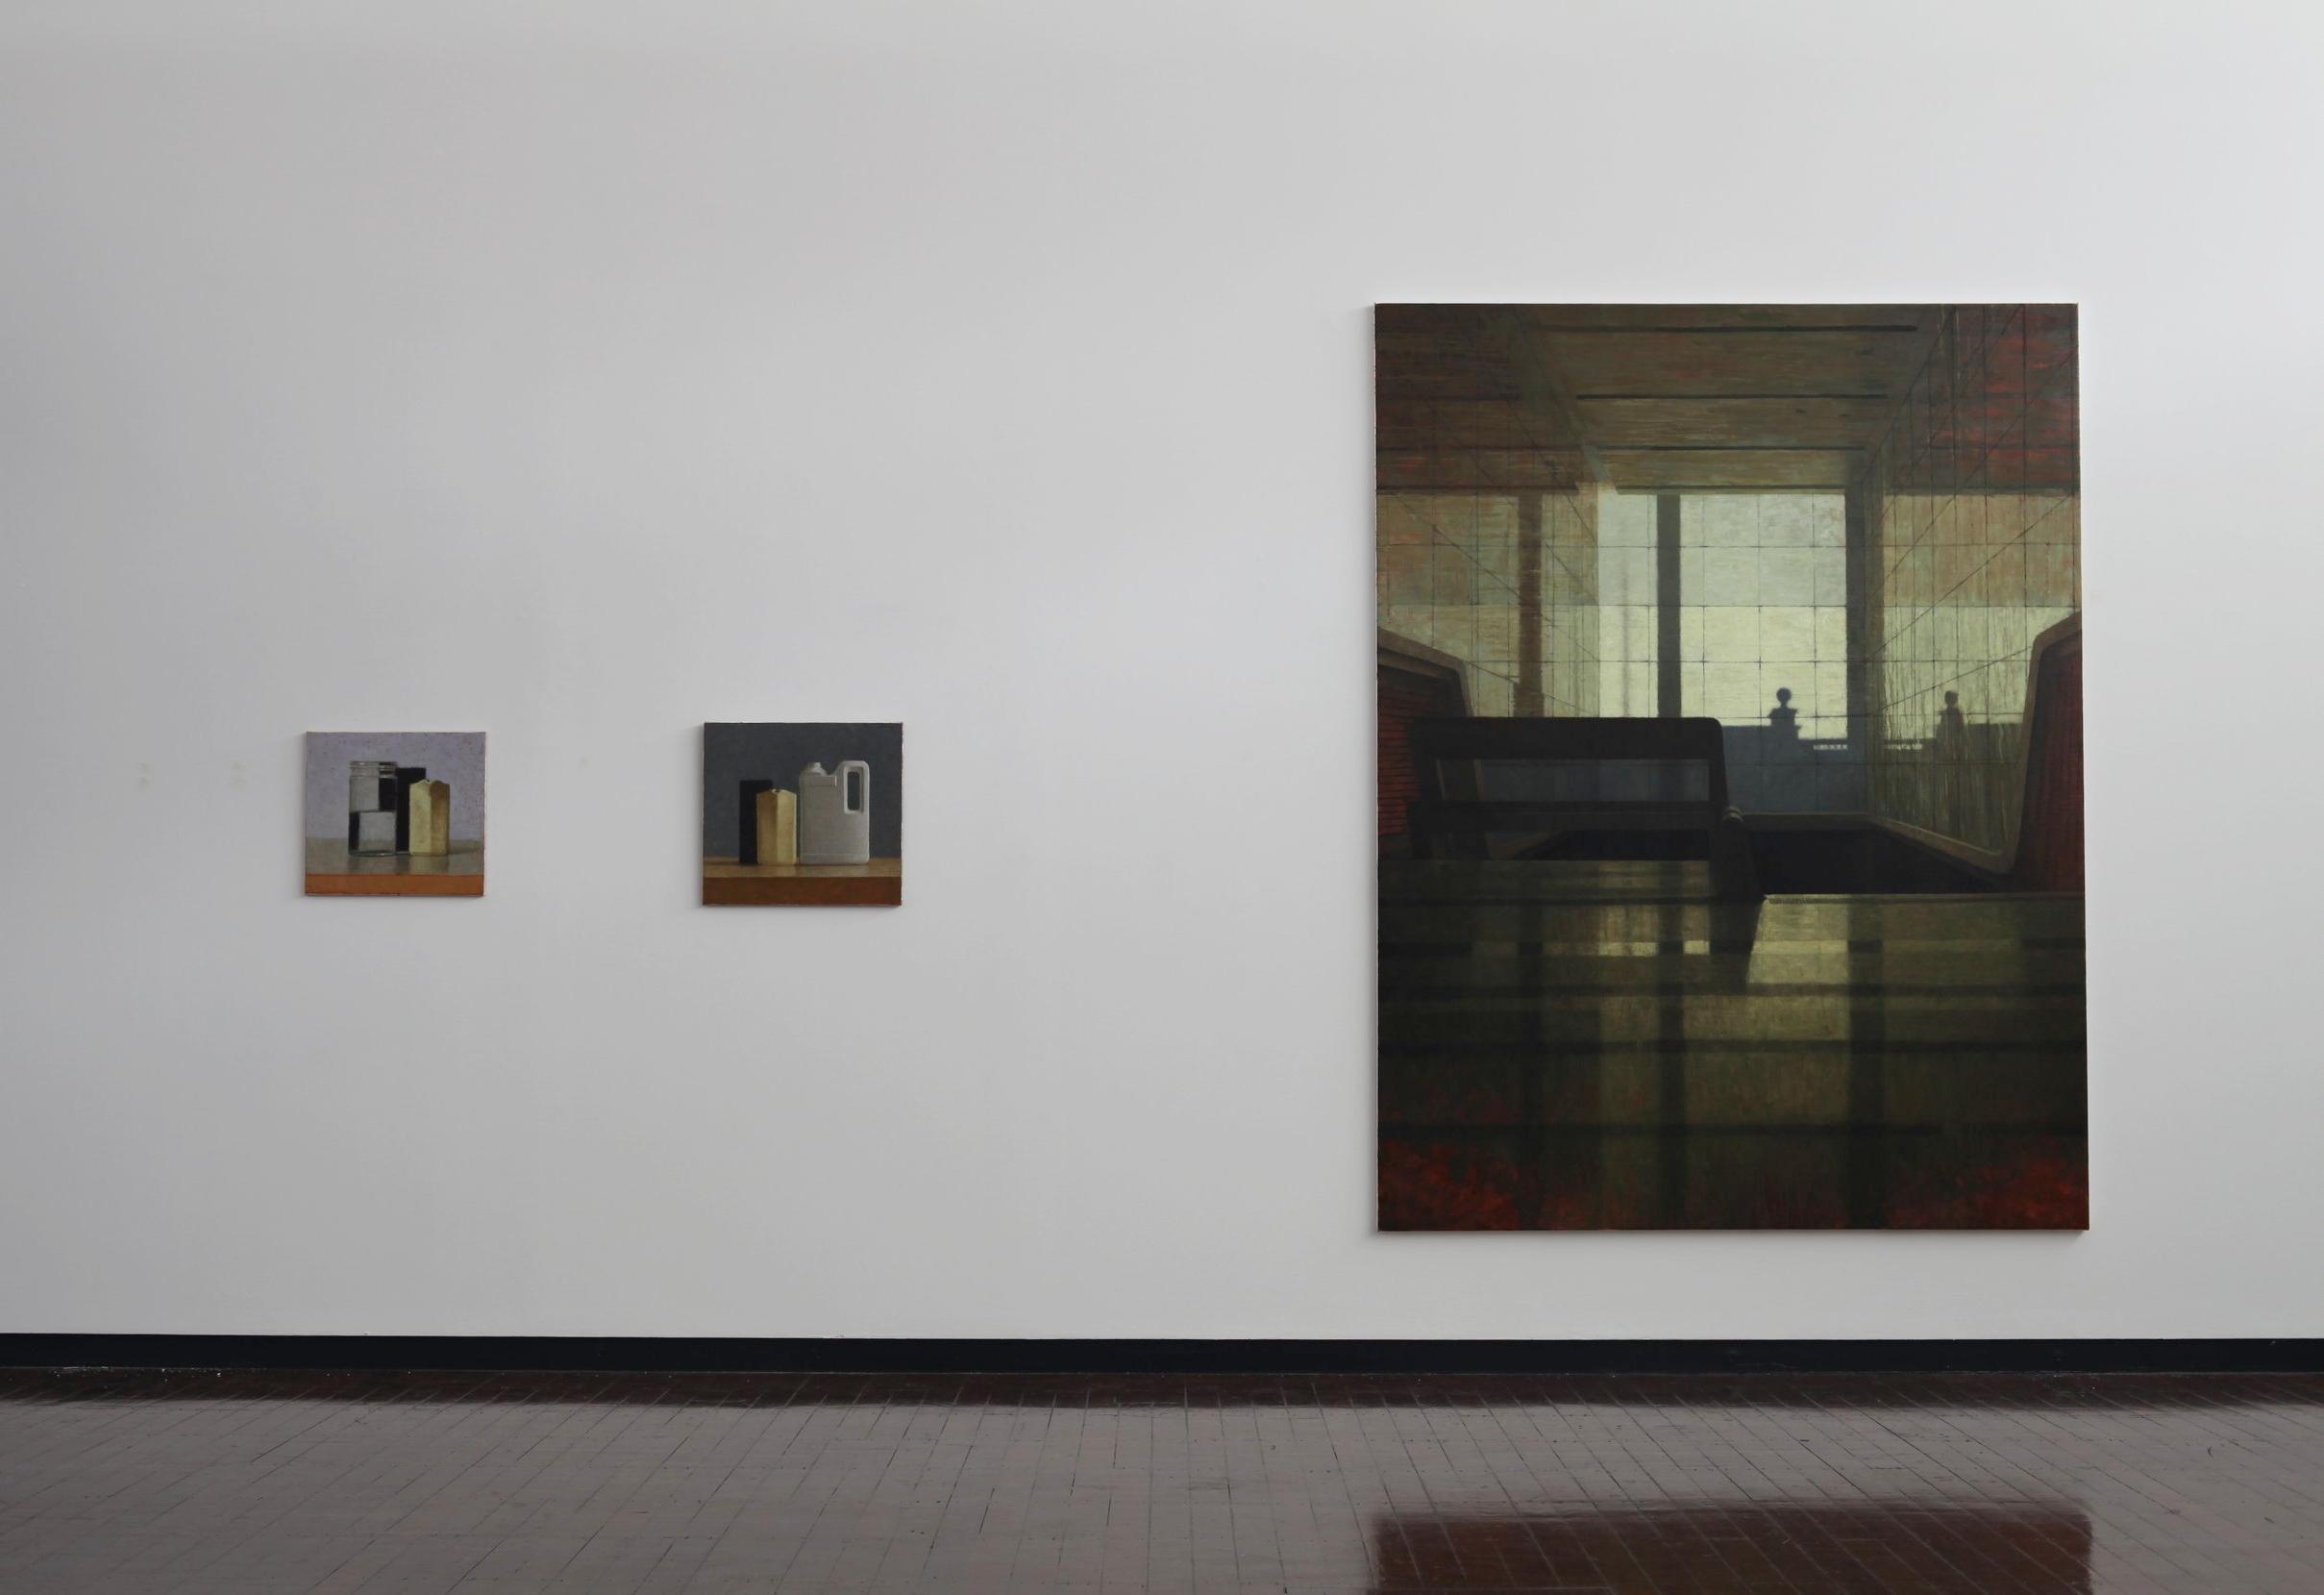 Installation, ANU Drill Hall Gallery, Canberra 2017